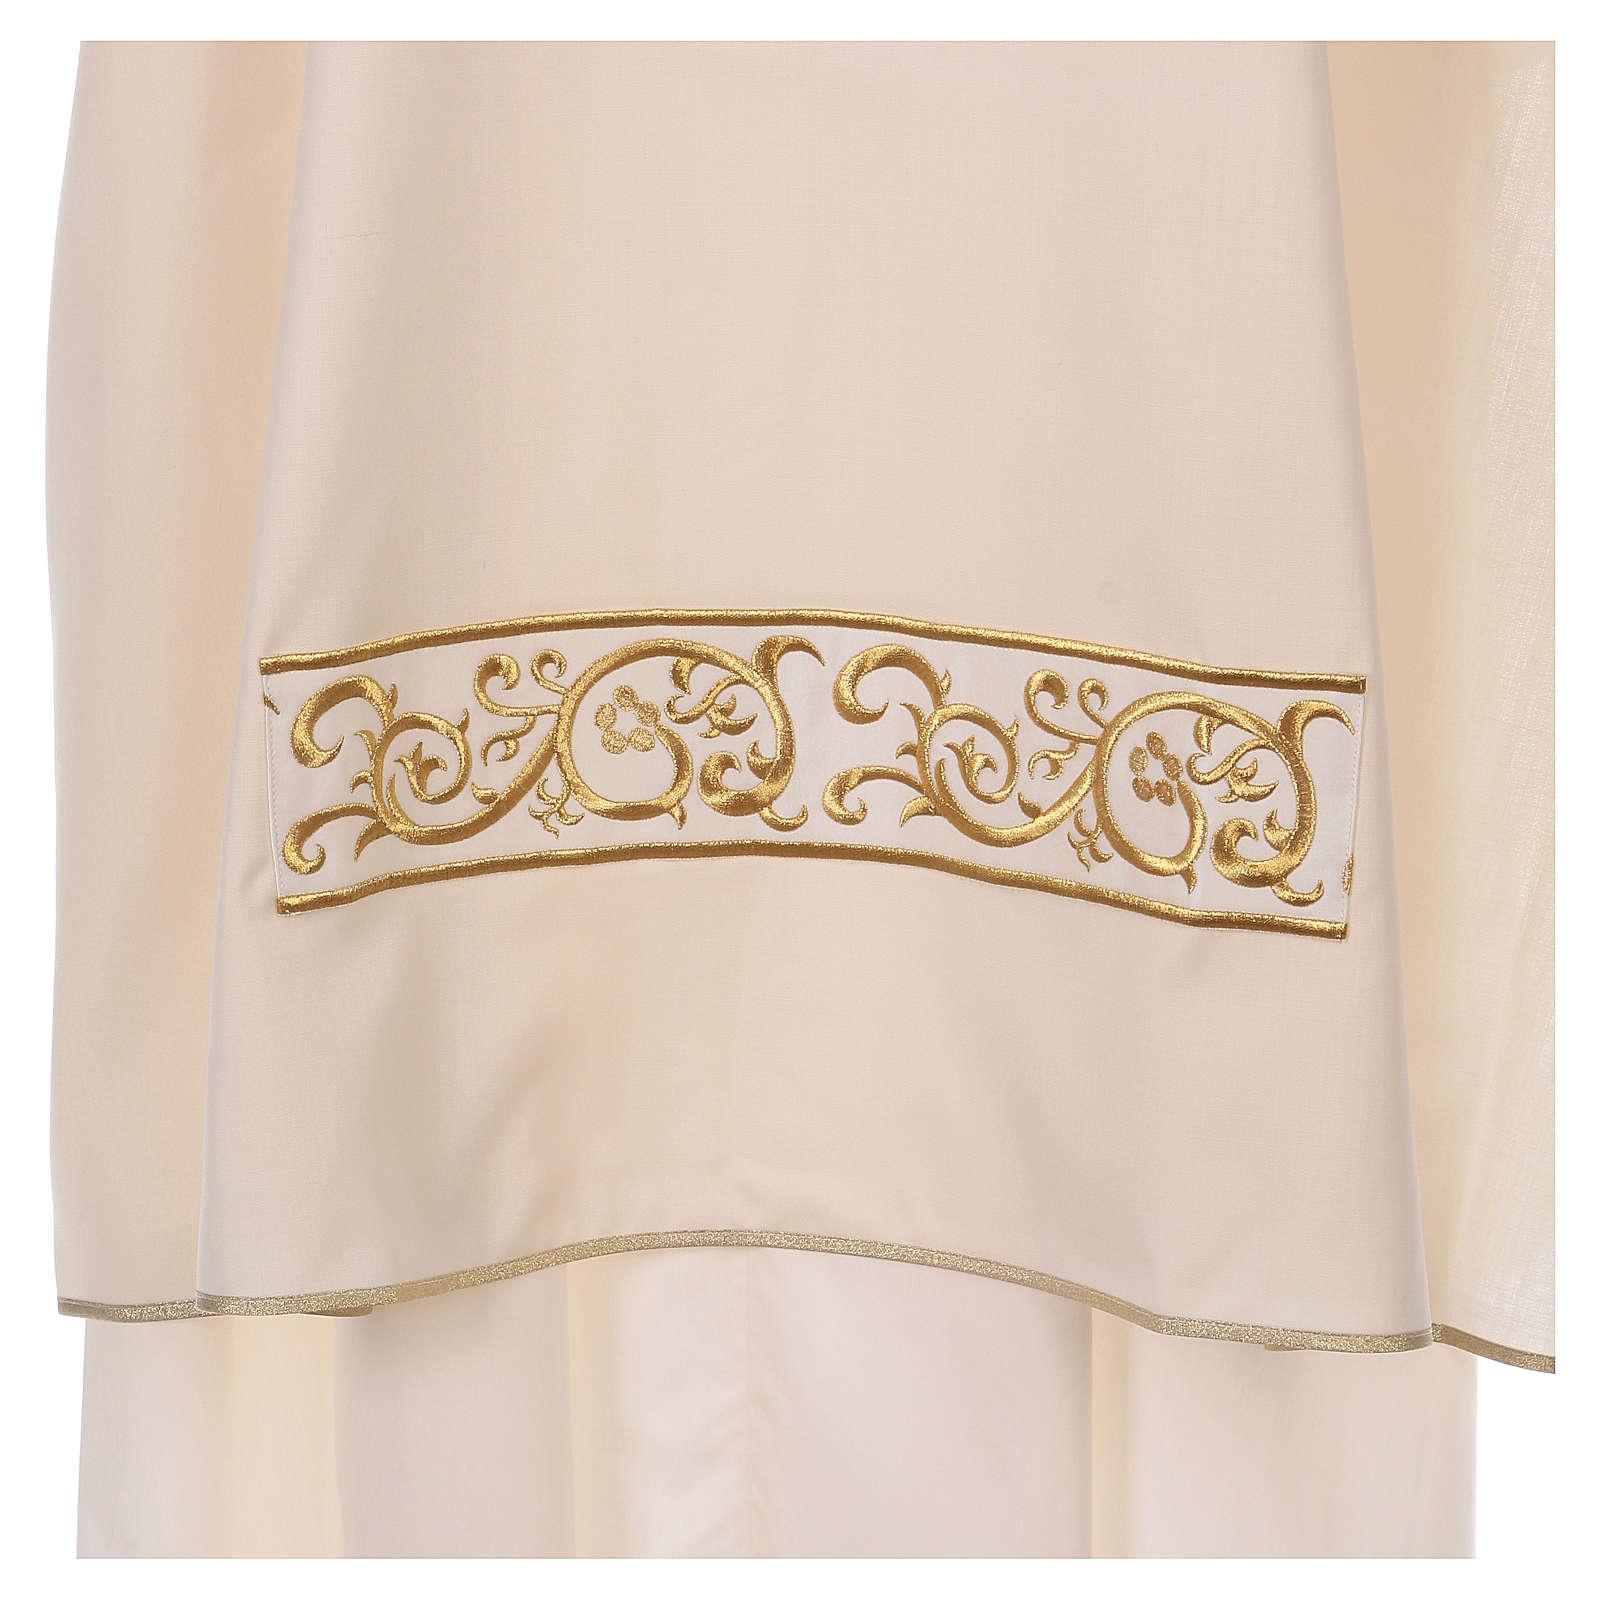 Dalmatik, Farbe elfenbein, 100% Wolle, Borte mit goldfarbenen Stickereien 4